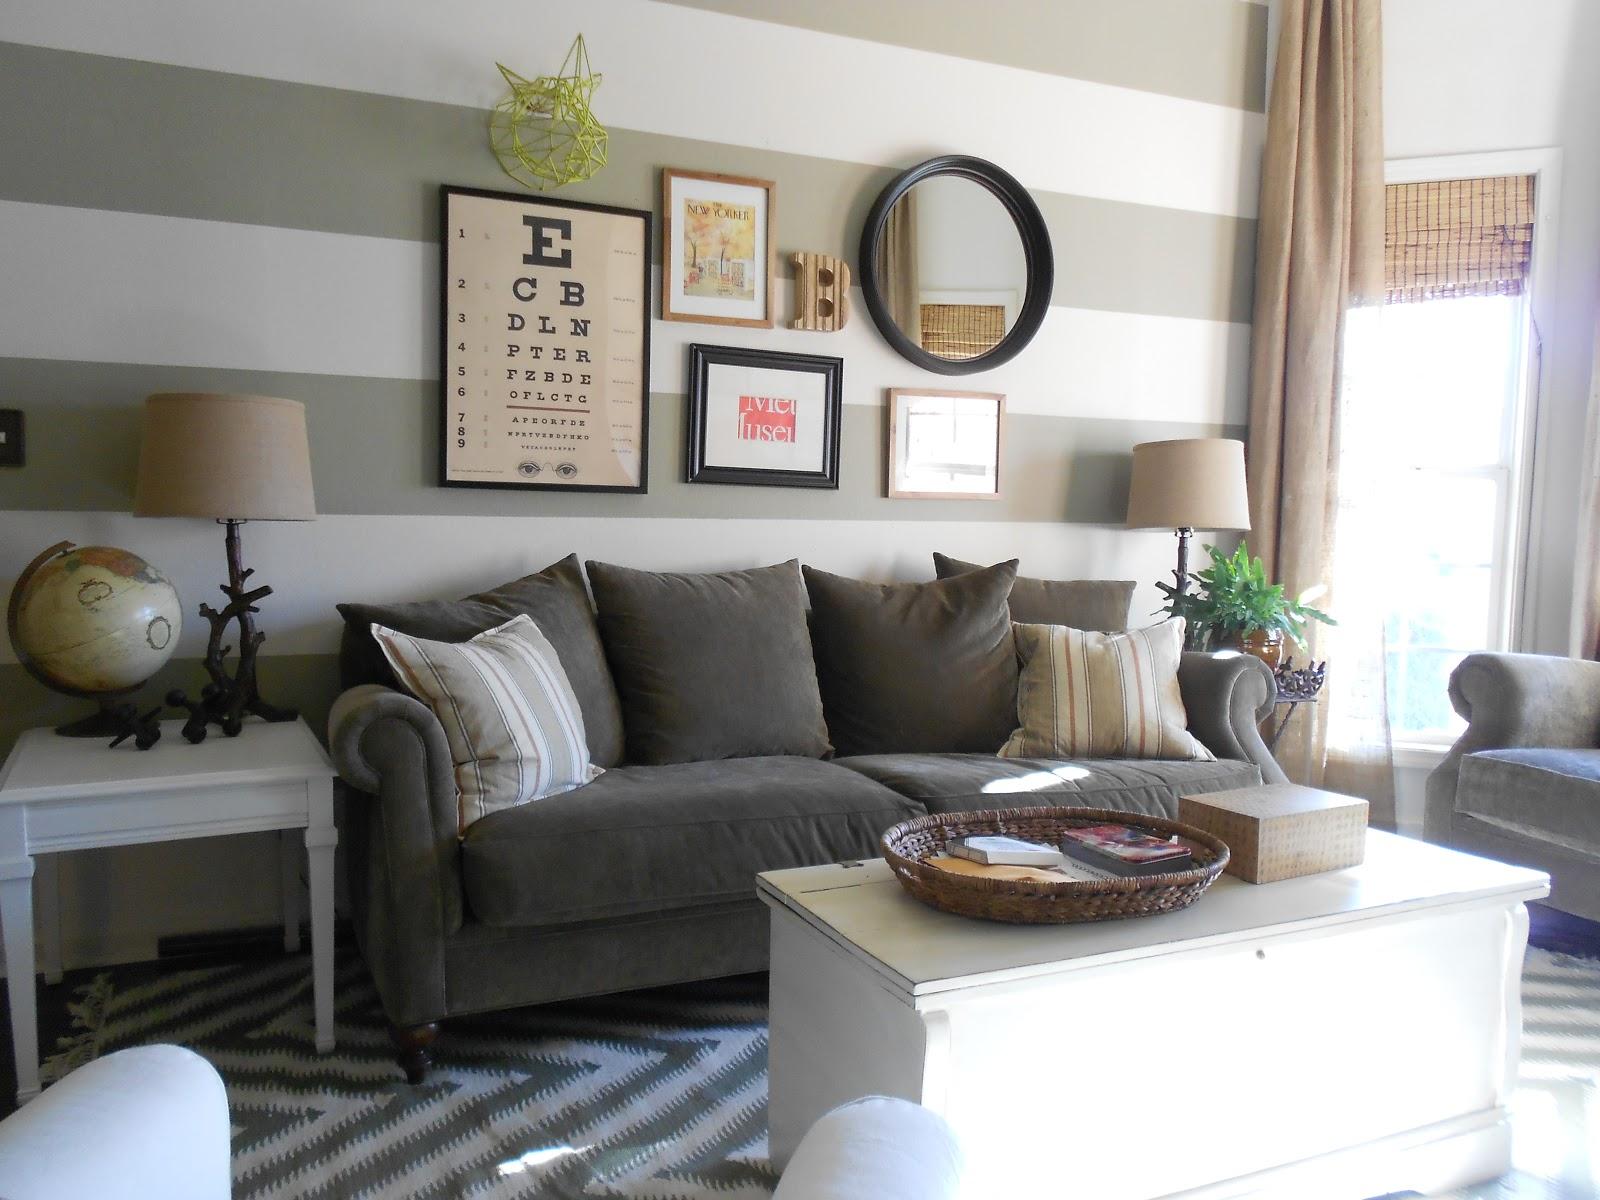 House Tweaking-The Playroom - Oak House Design Co.